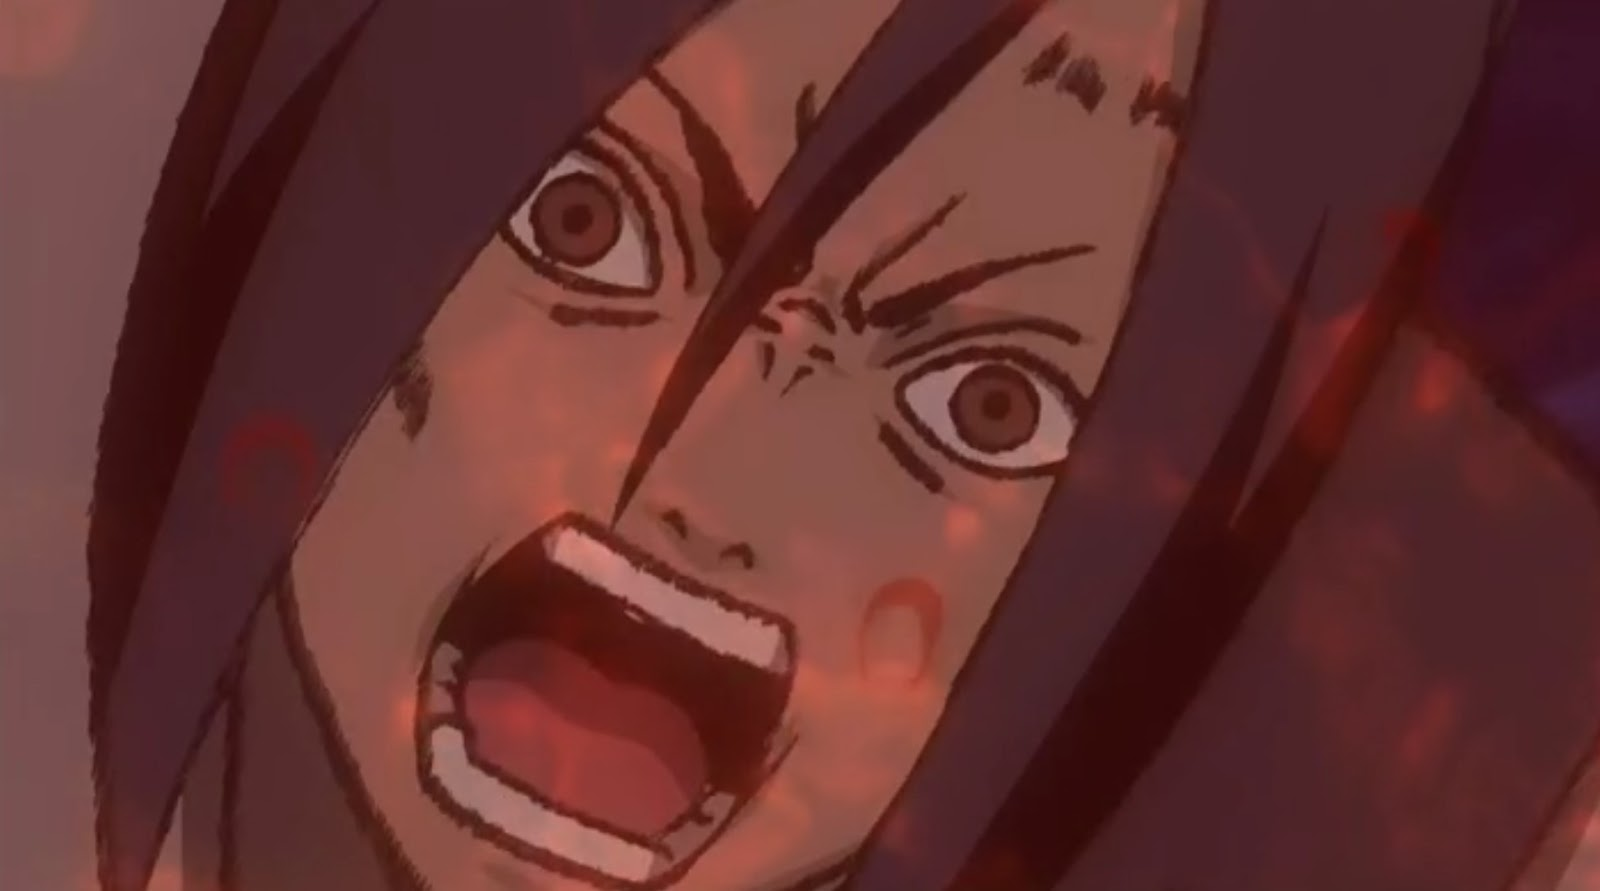 Naruto Shippuden Episódio 68-69, Assistir Naruto Shippuden Episódio 68-69, Assistir Naruto Shippuden, Naruto Shippuden episódio 68-69,HD